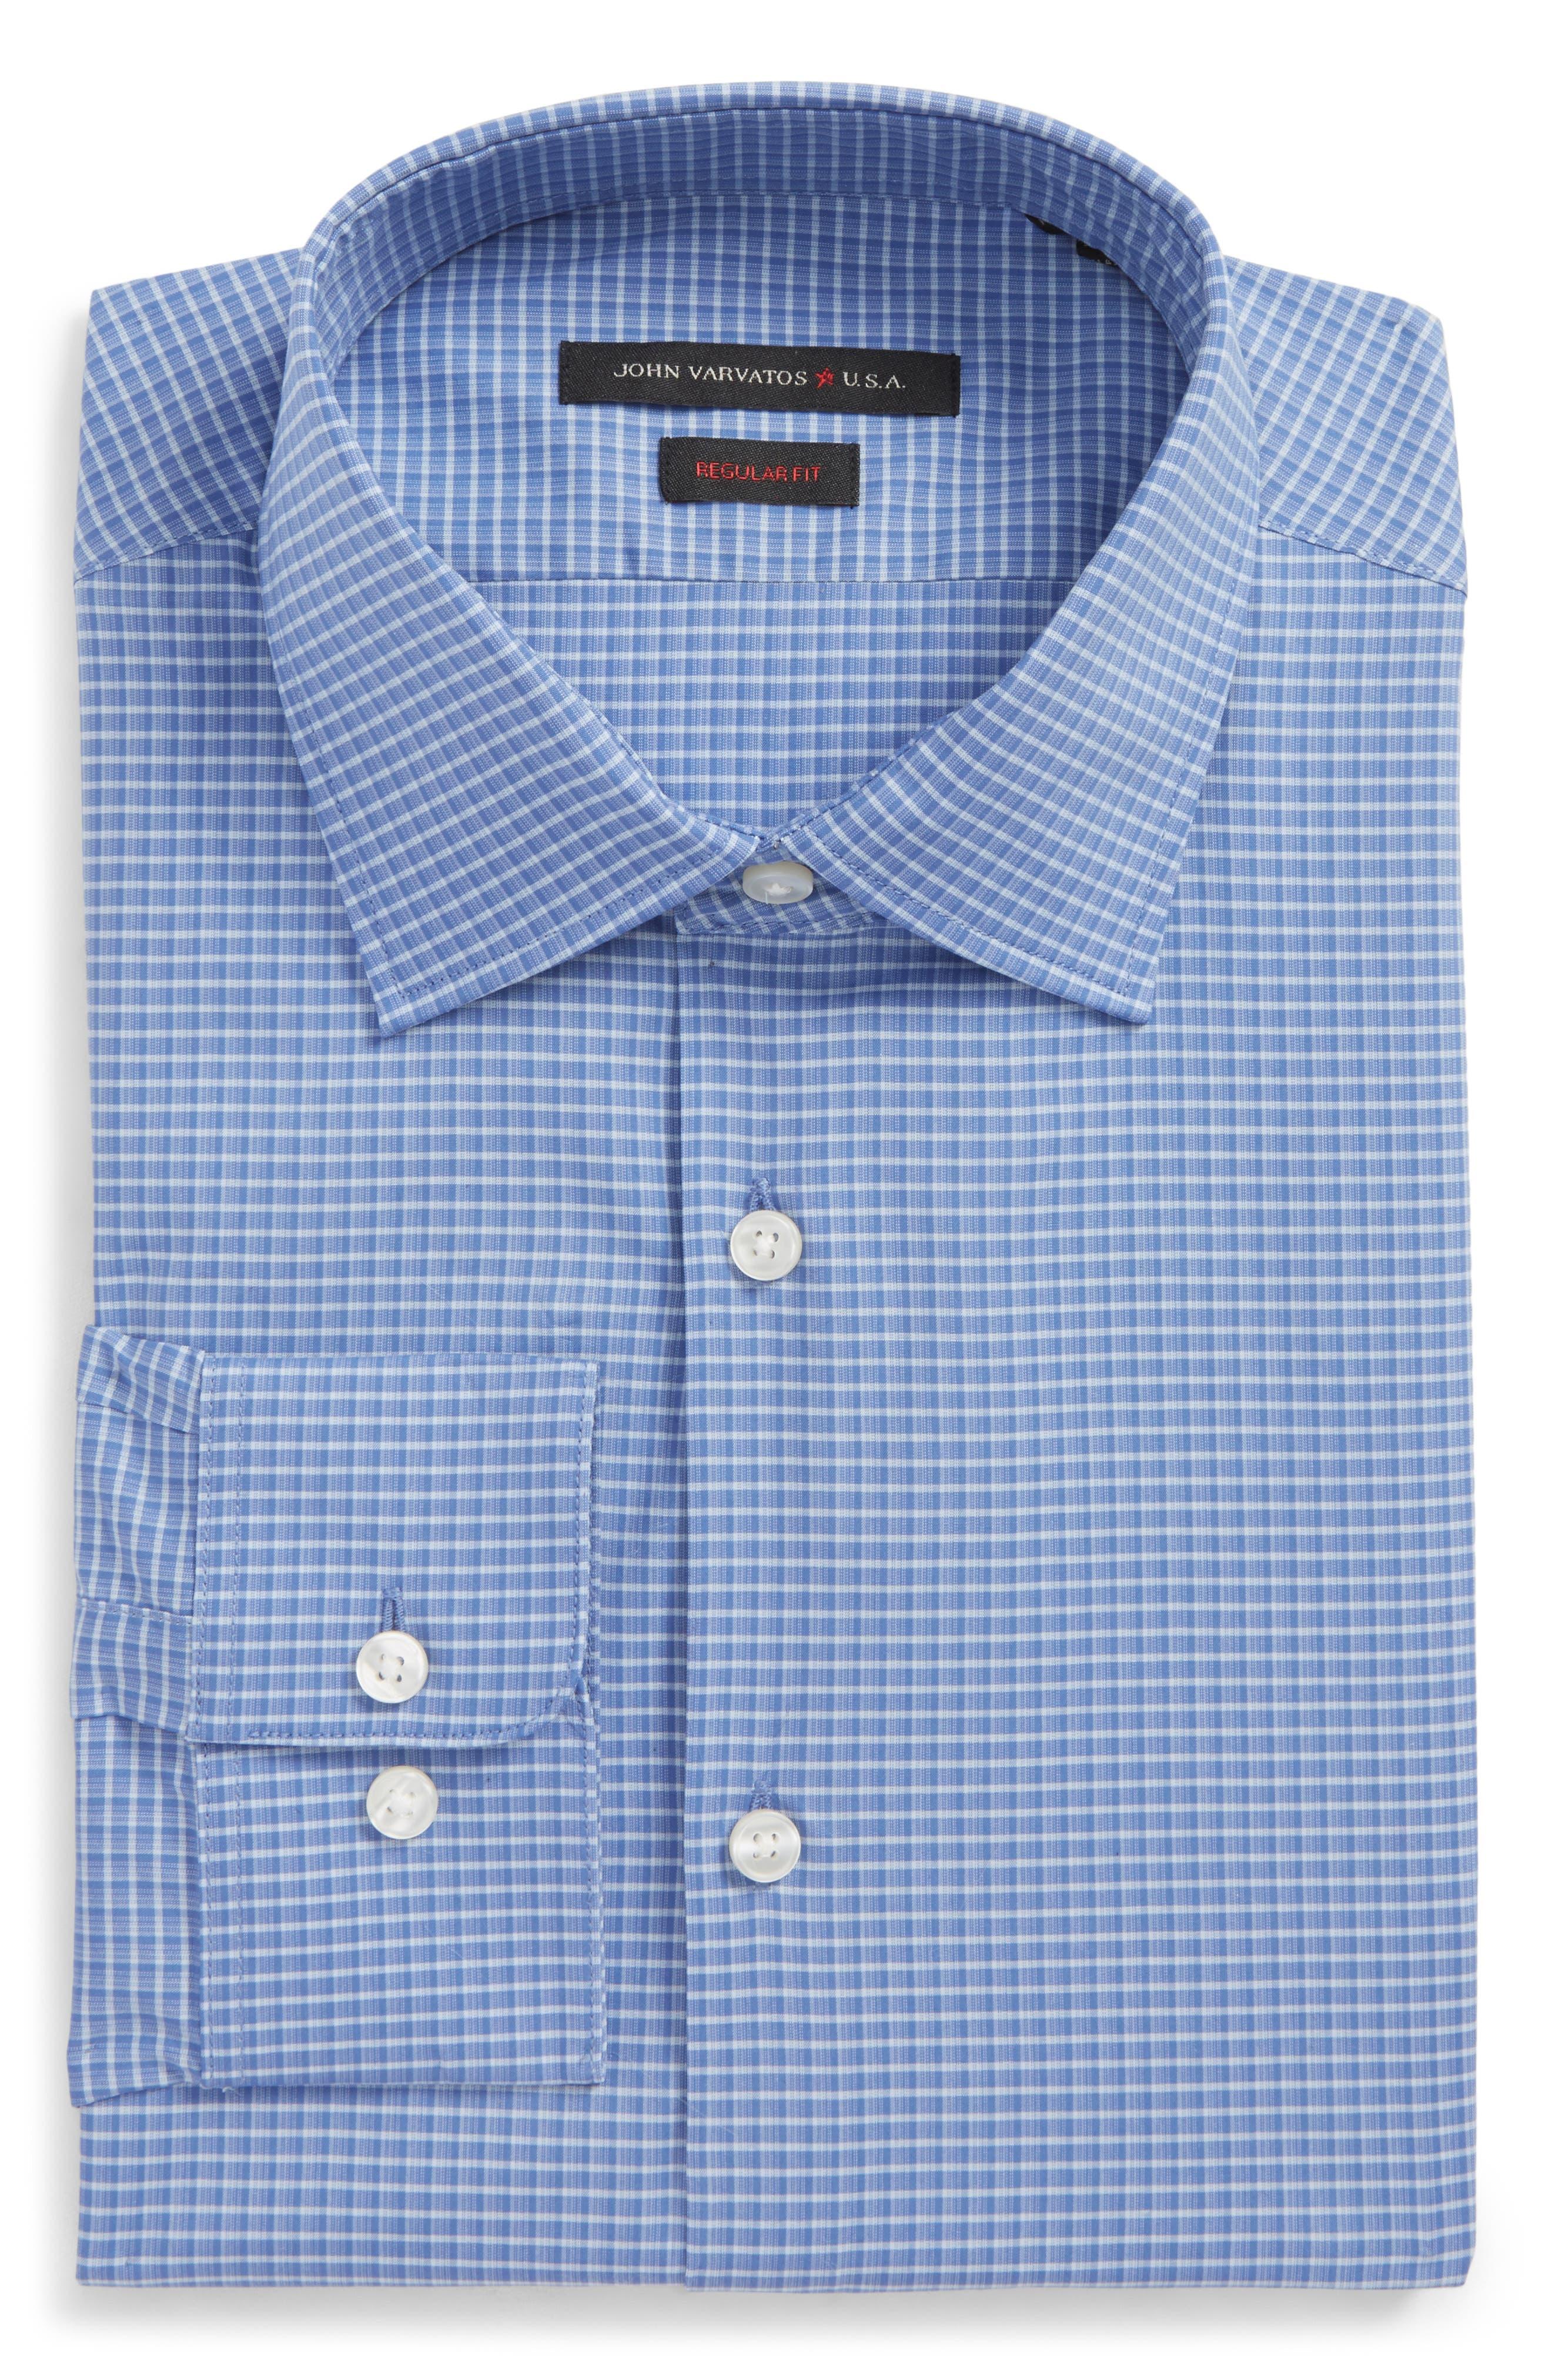 Regular Fit Stretch Plaid Dress Shirt,                             Main thumbnail 1, color,                             433